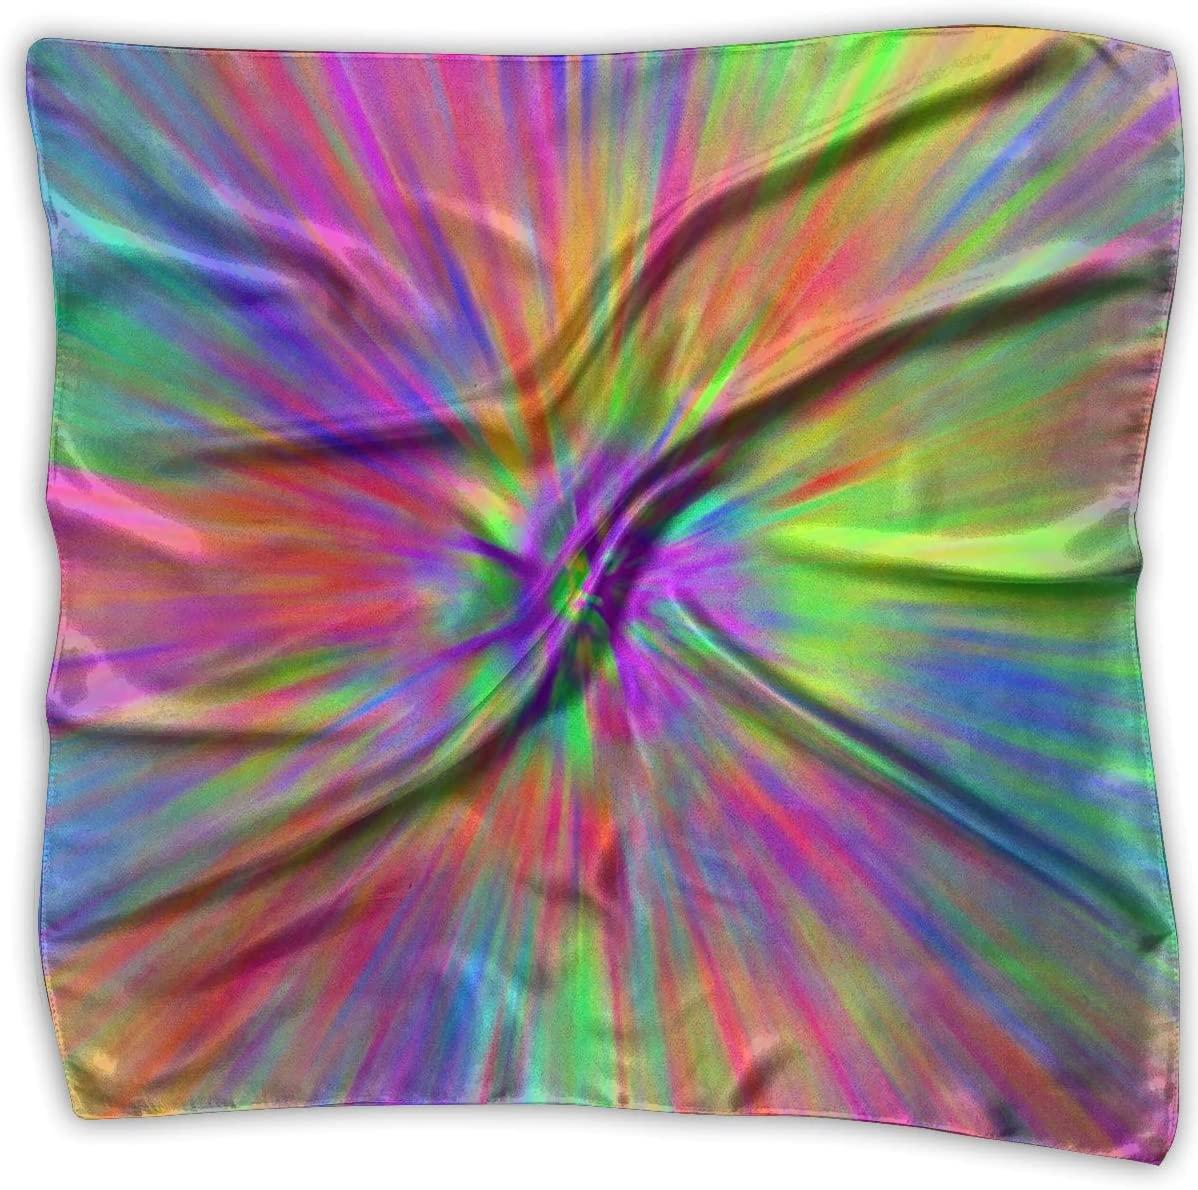 WFIRE Tye Dye Patterns Square Handkerchiefs Scarf Shawl Bandanas Headscarf Neckerchief Tie Hair Scarf